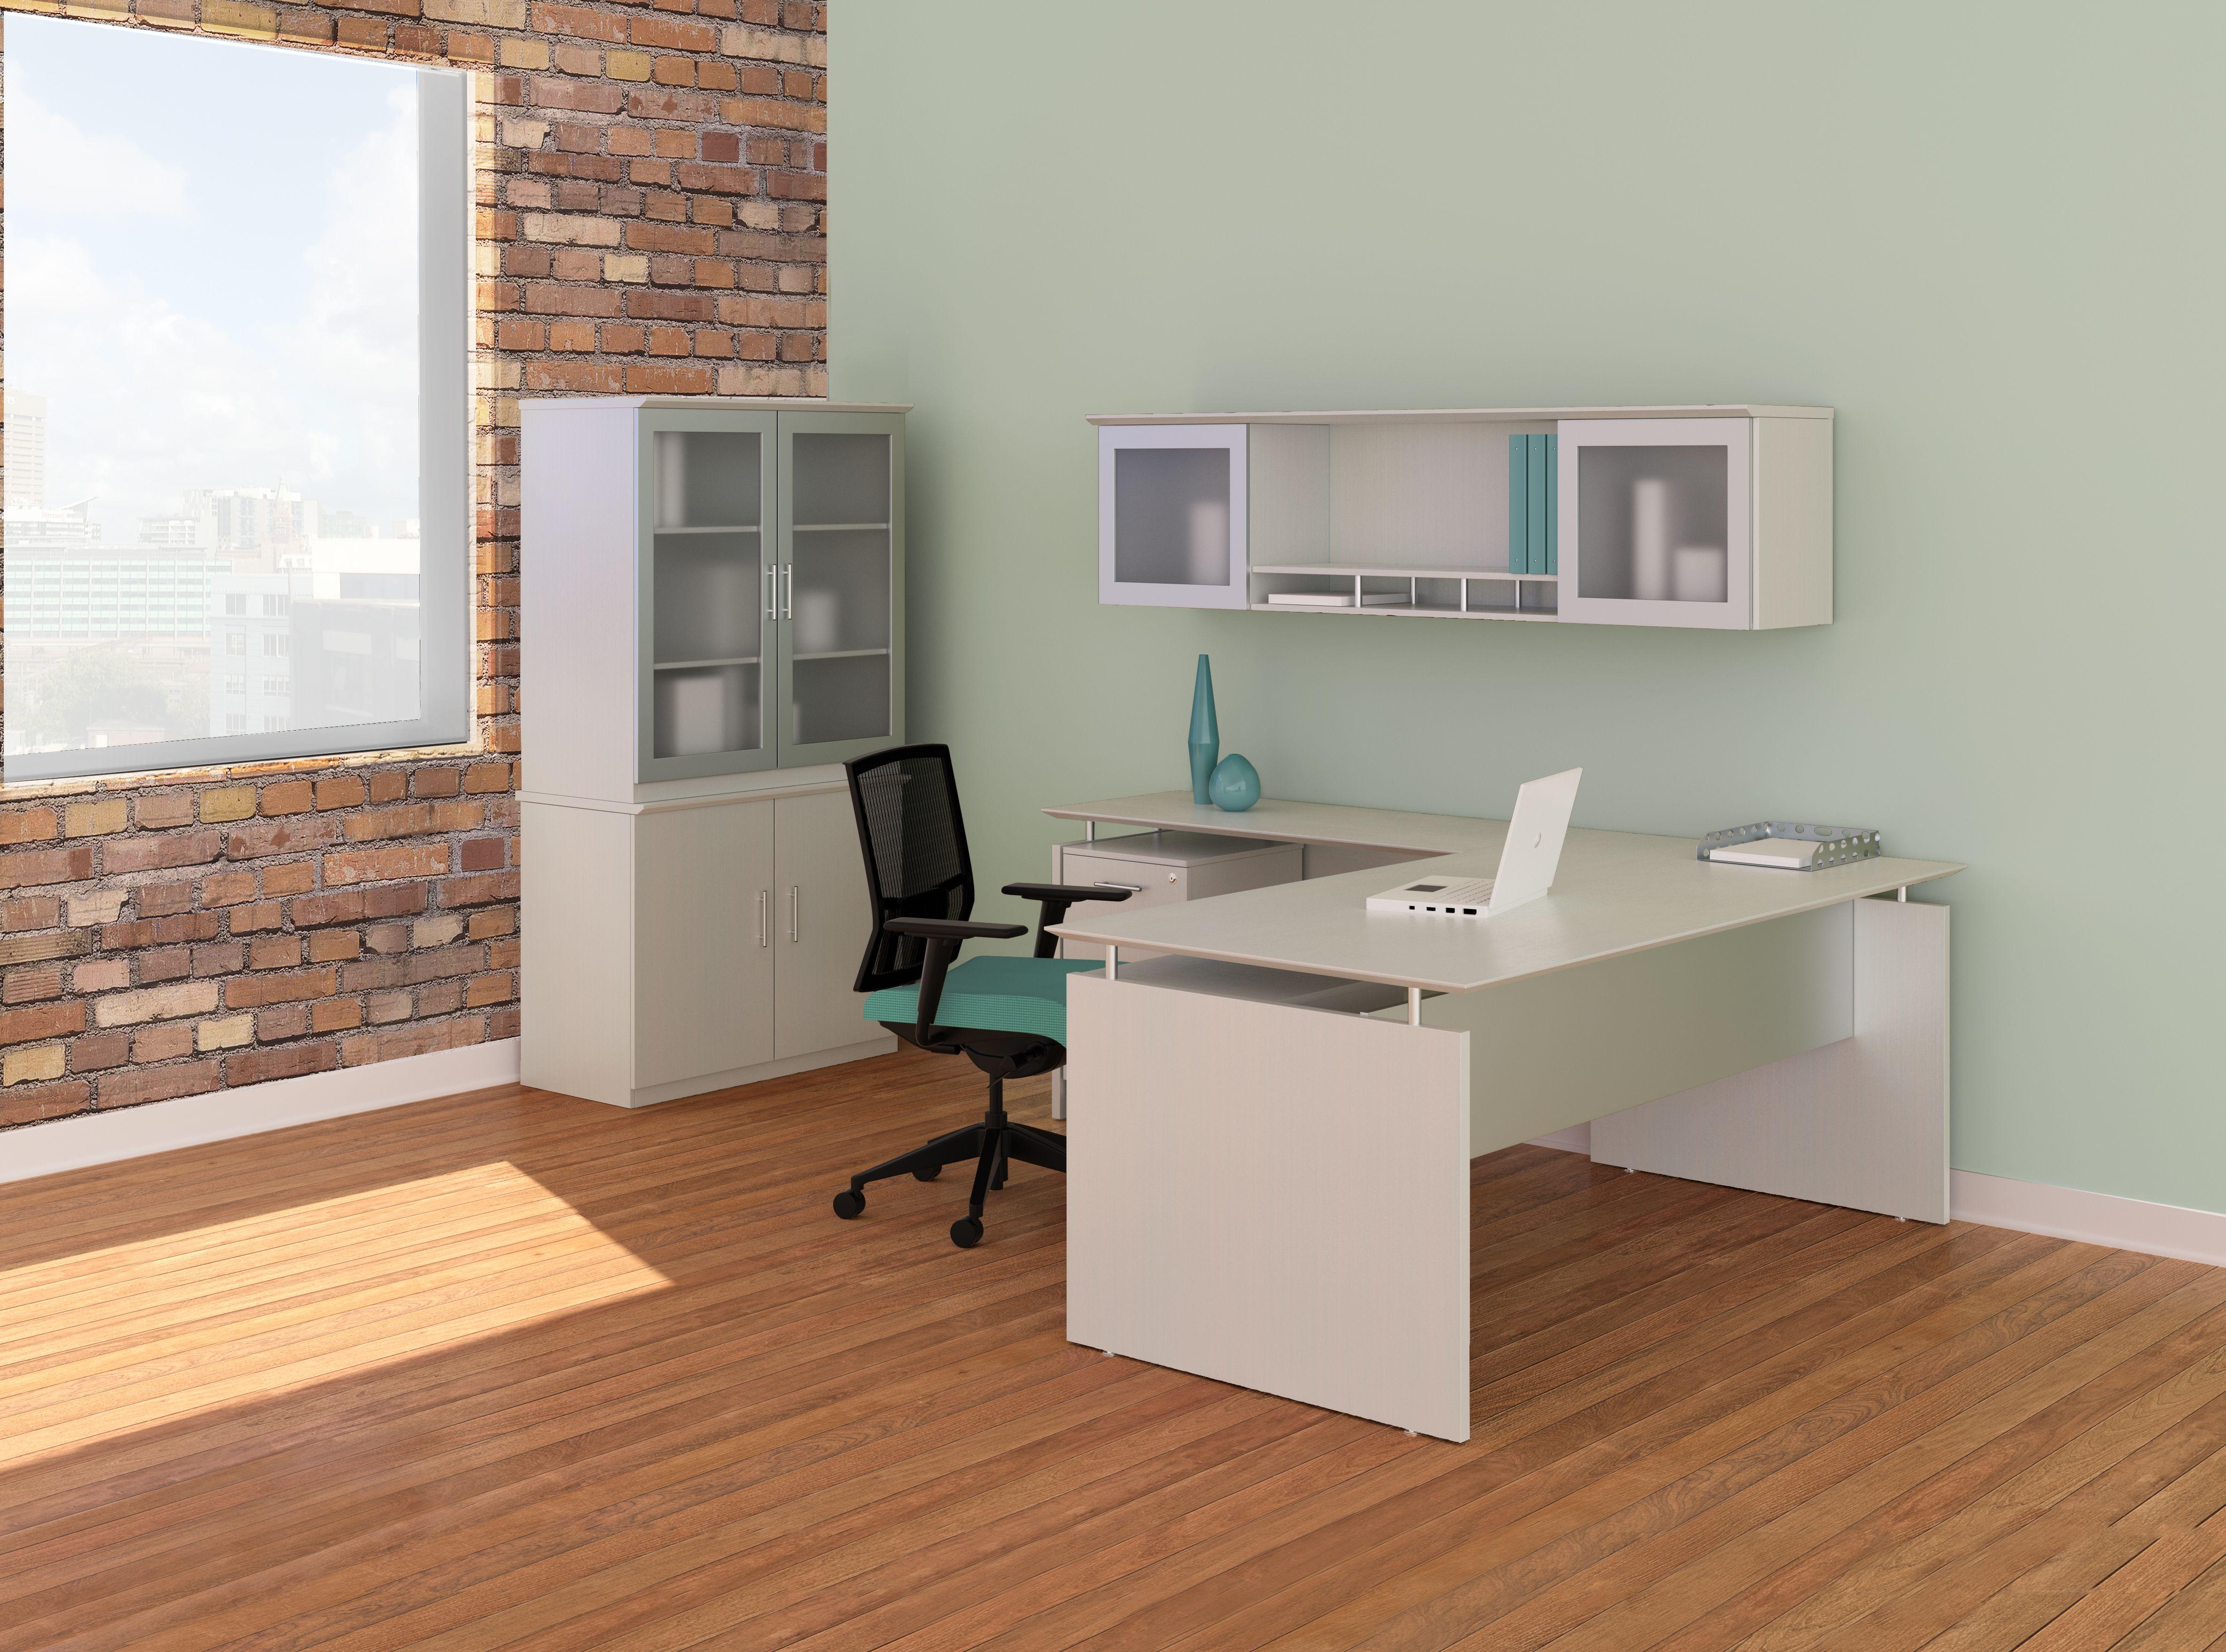 cool stuff for office desk. Medina Straight L Desk - Color: Sea Salt #neocon2015 Cool Stuff For Office